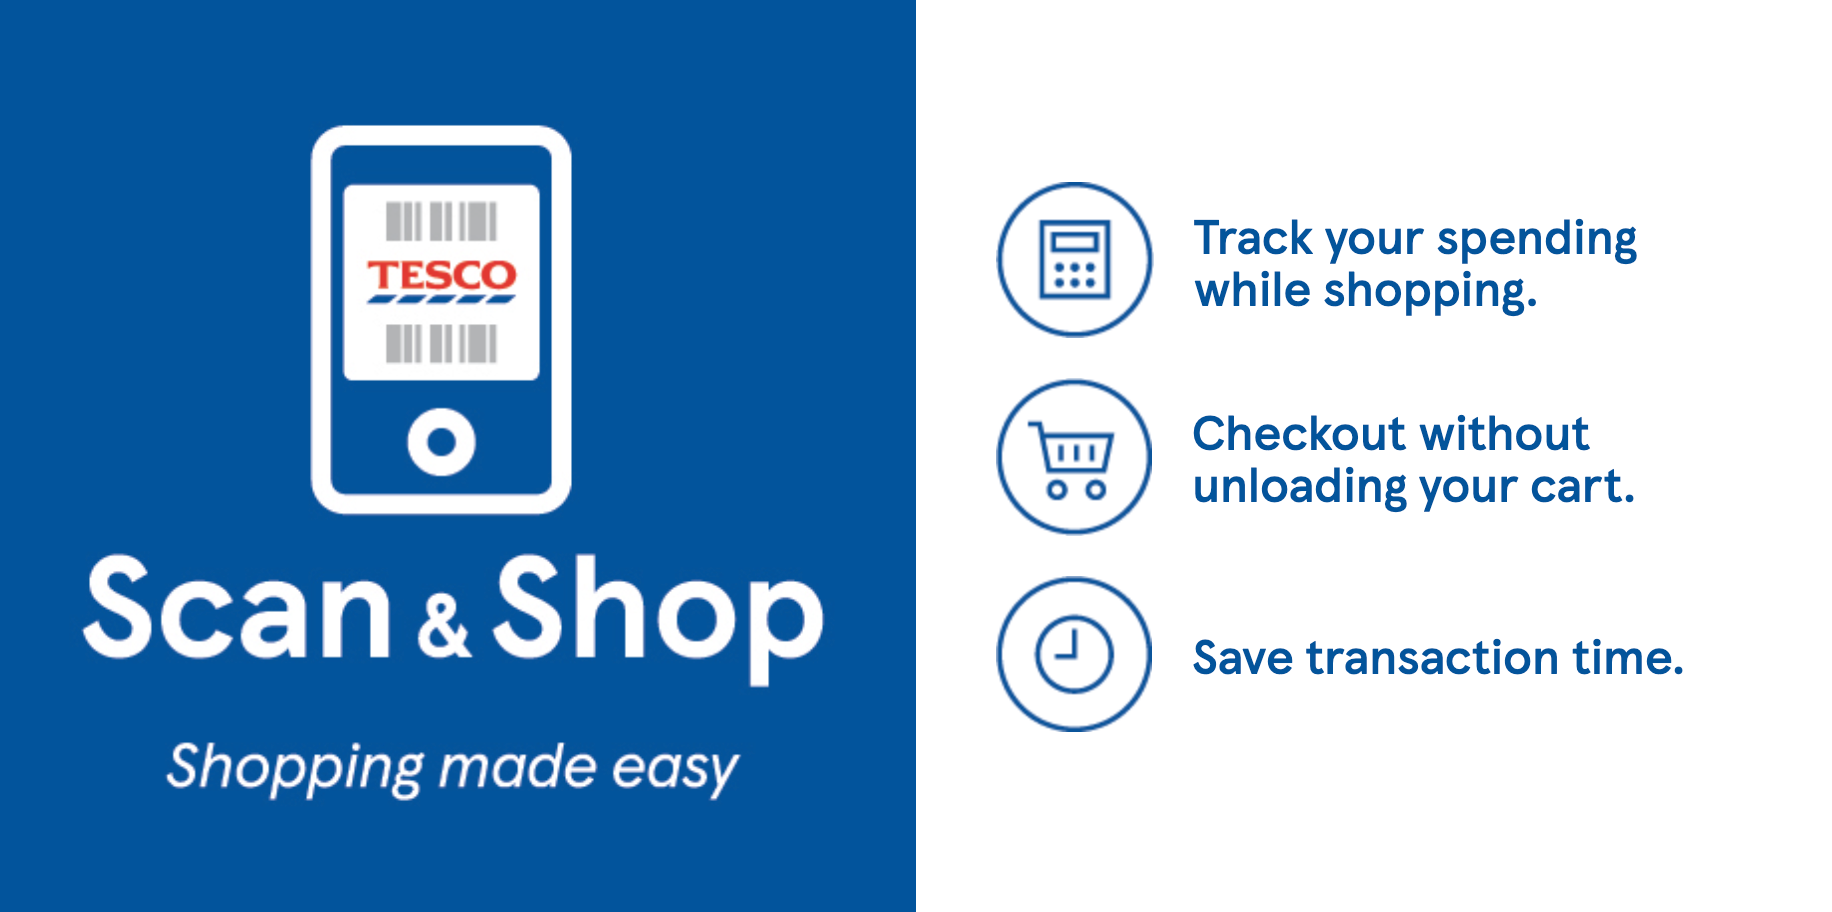 tesco scan and shop